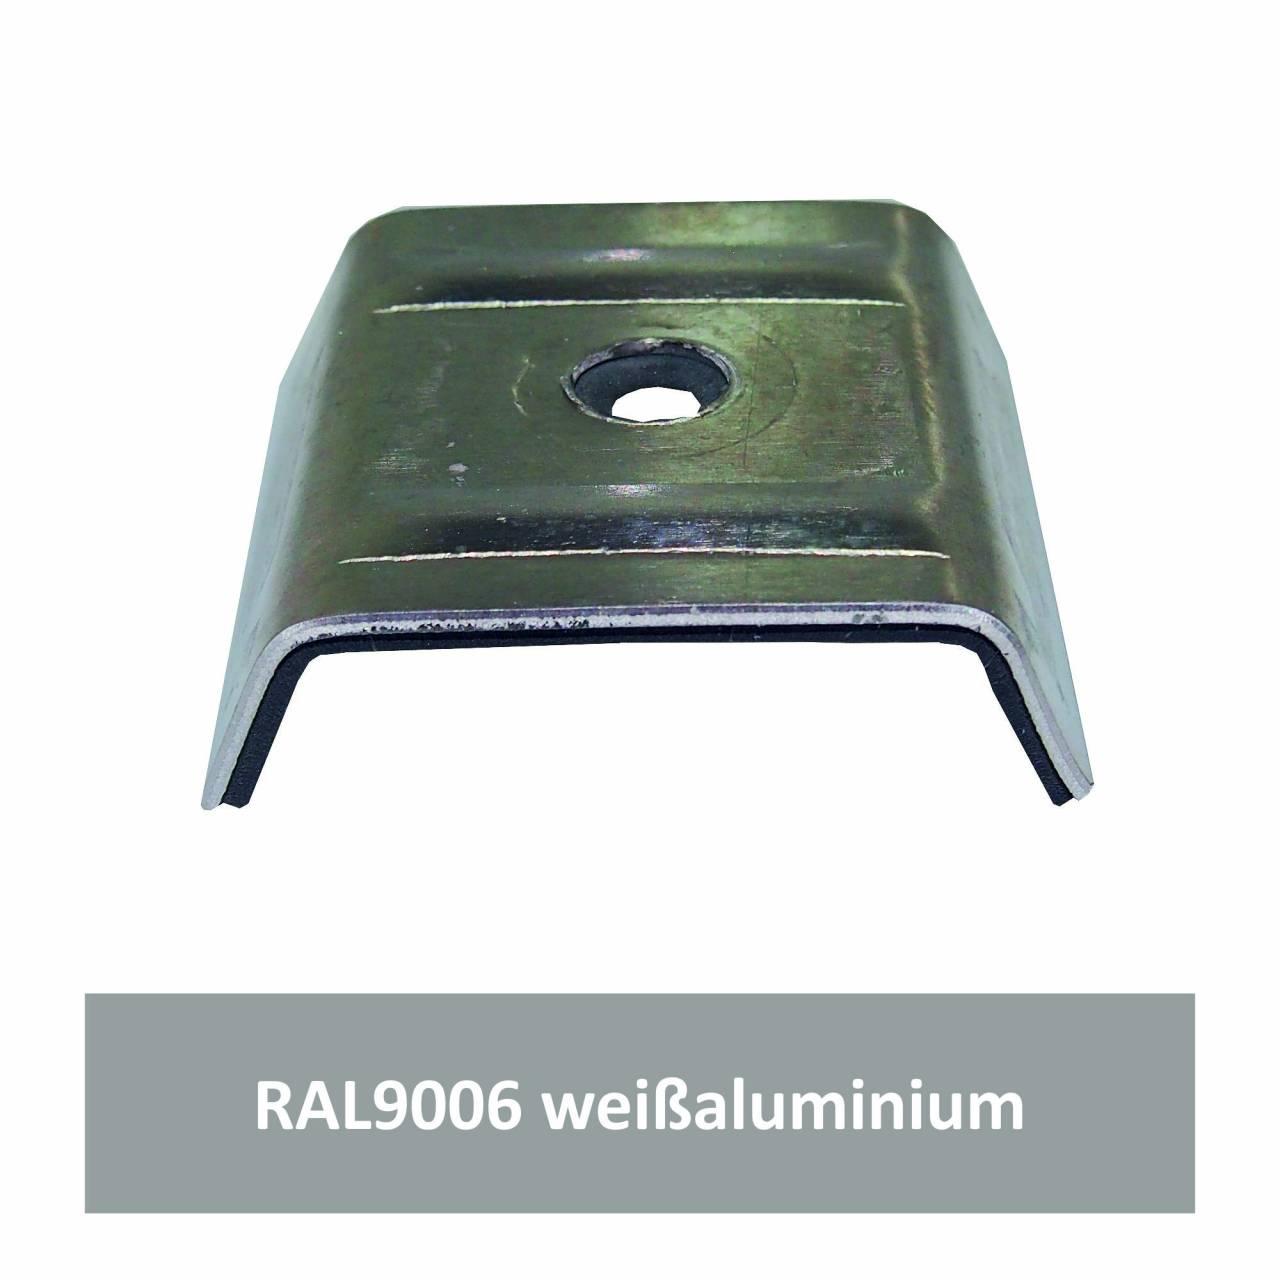 Kalotten für Kingspan, Alu RAL9006 weißaluminium / Pck a 100 Stück